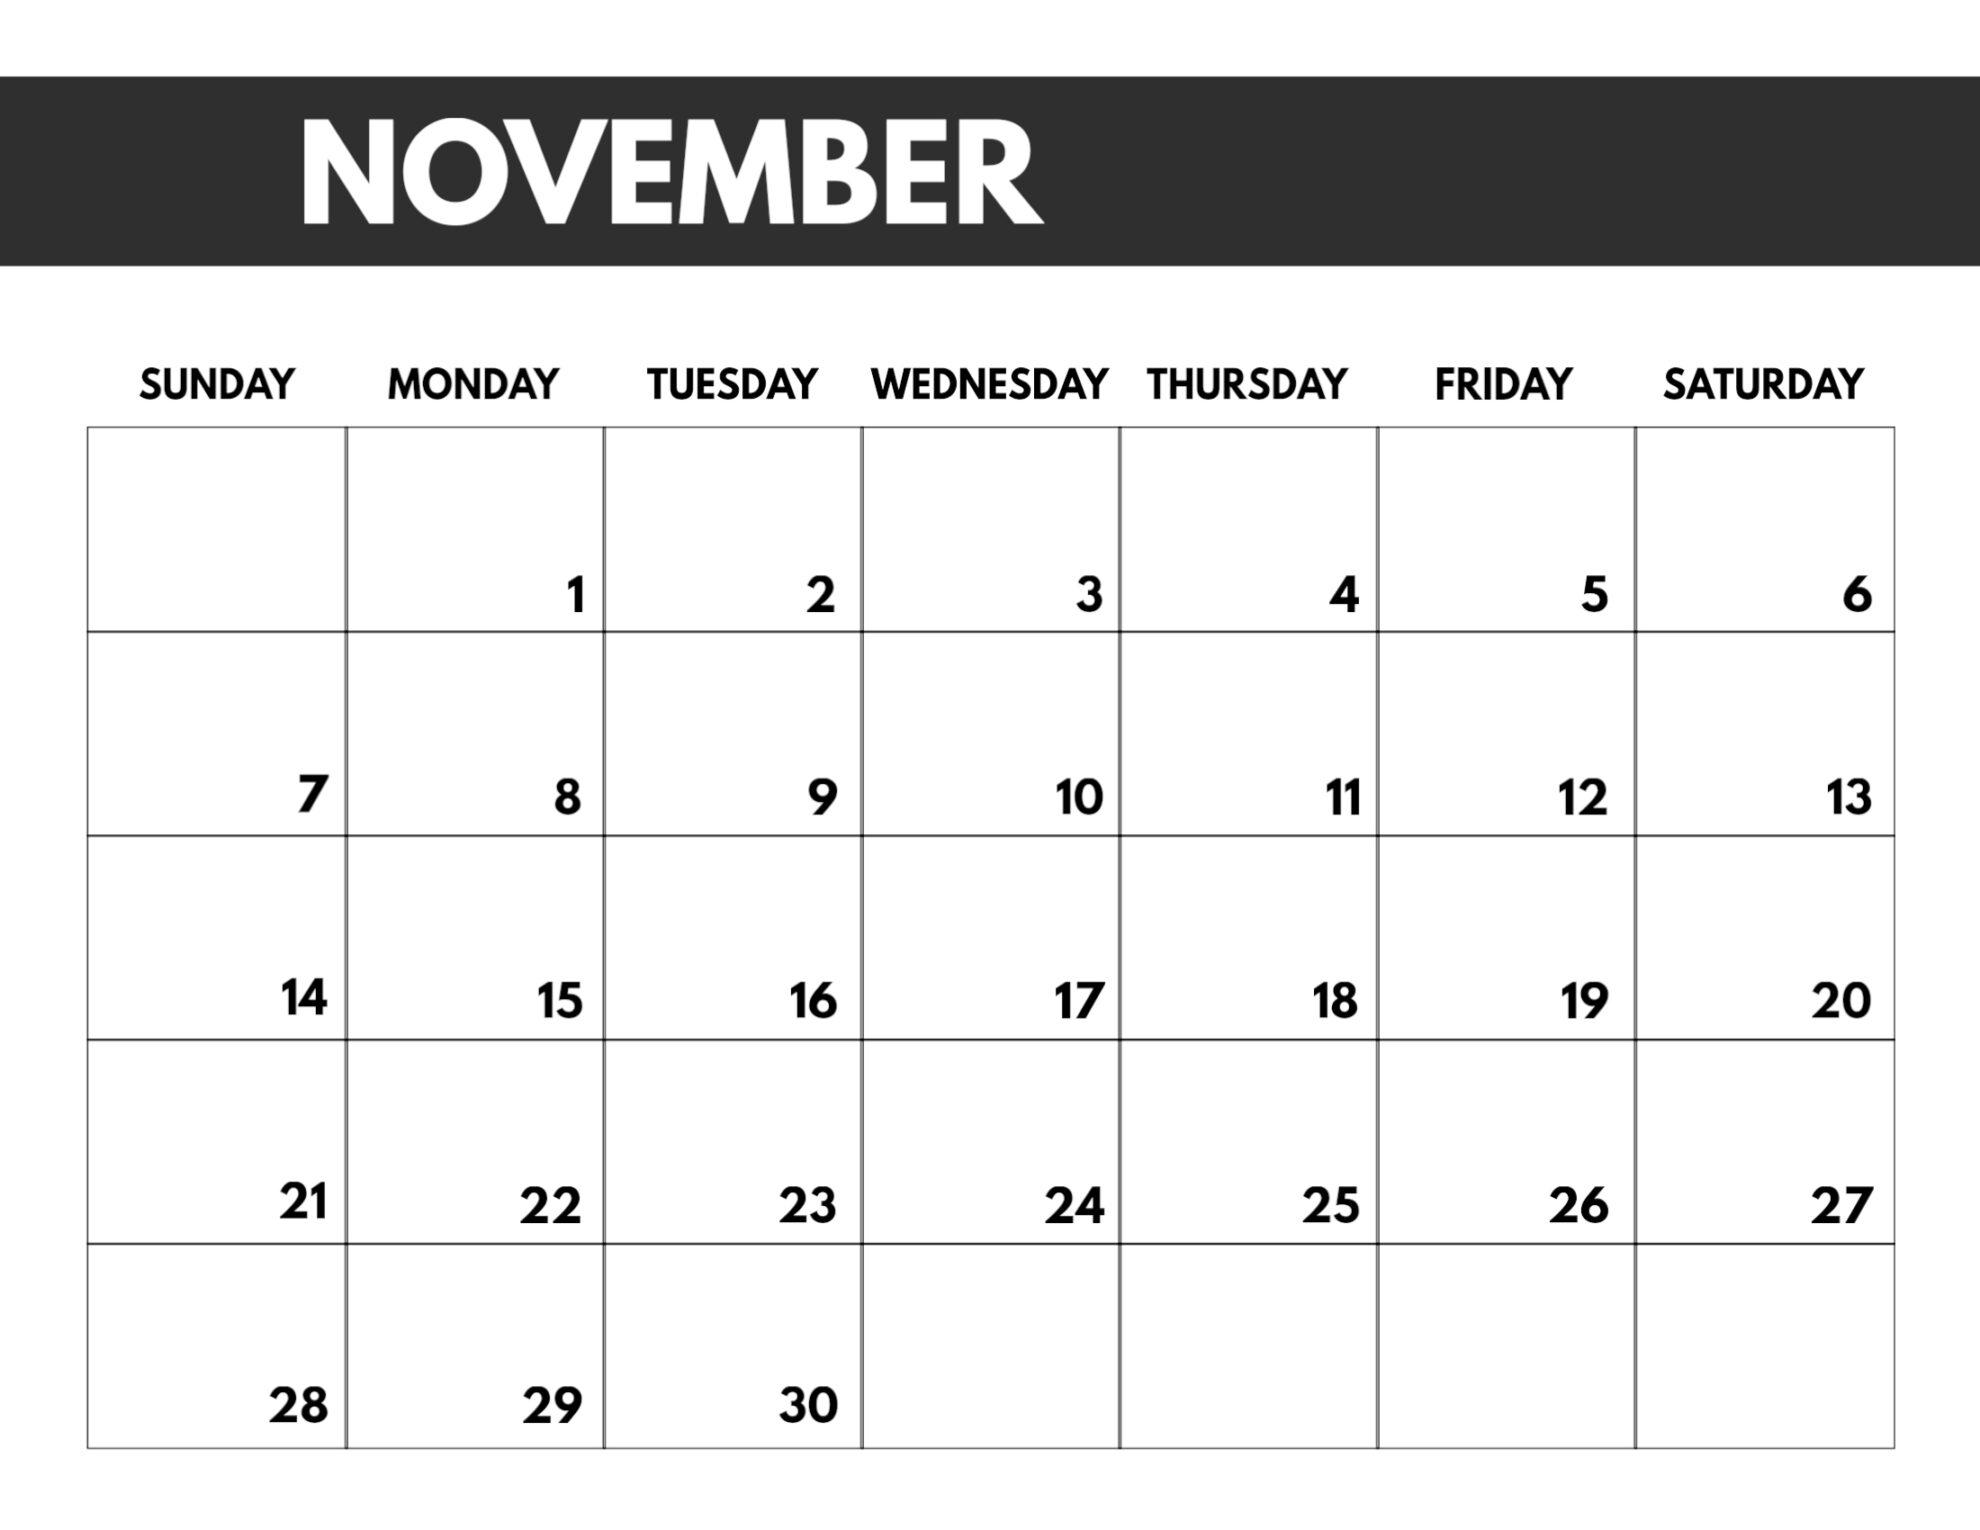 November Calendar 2021 With Holidays India